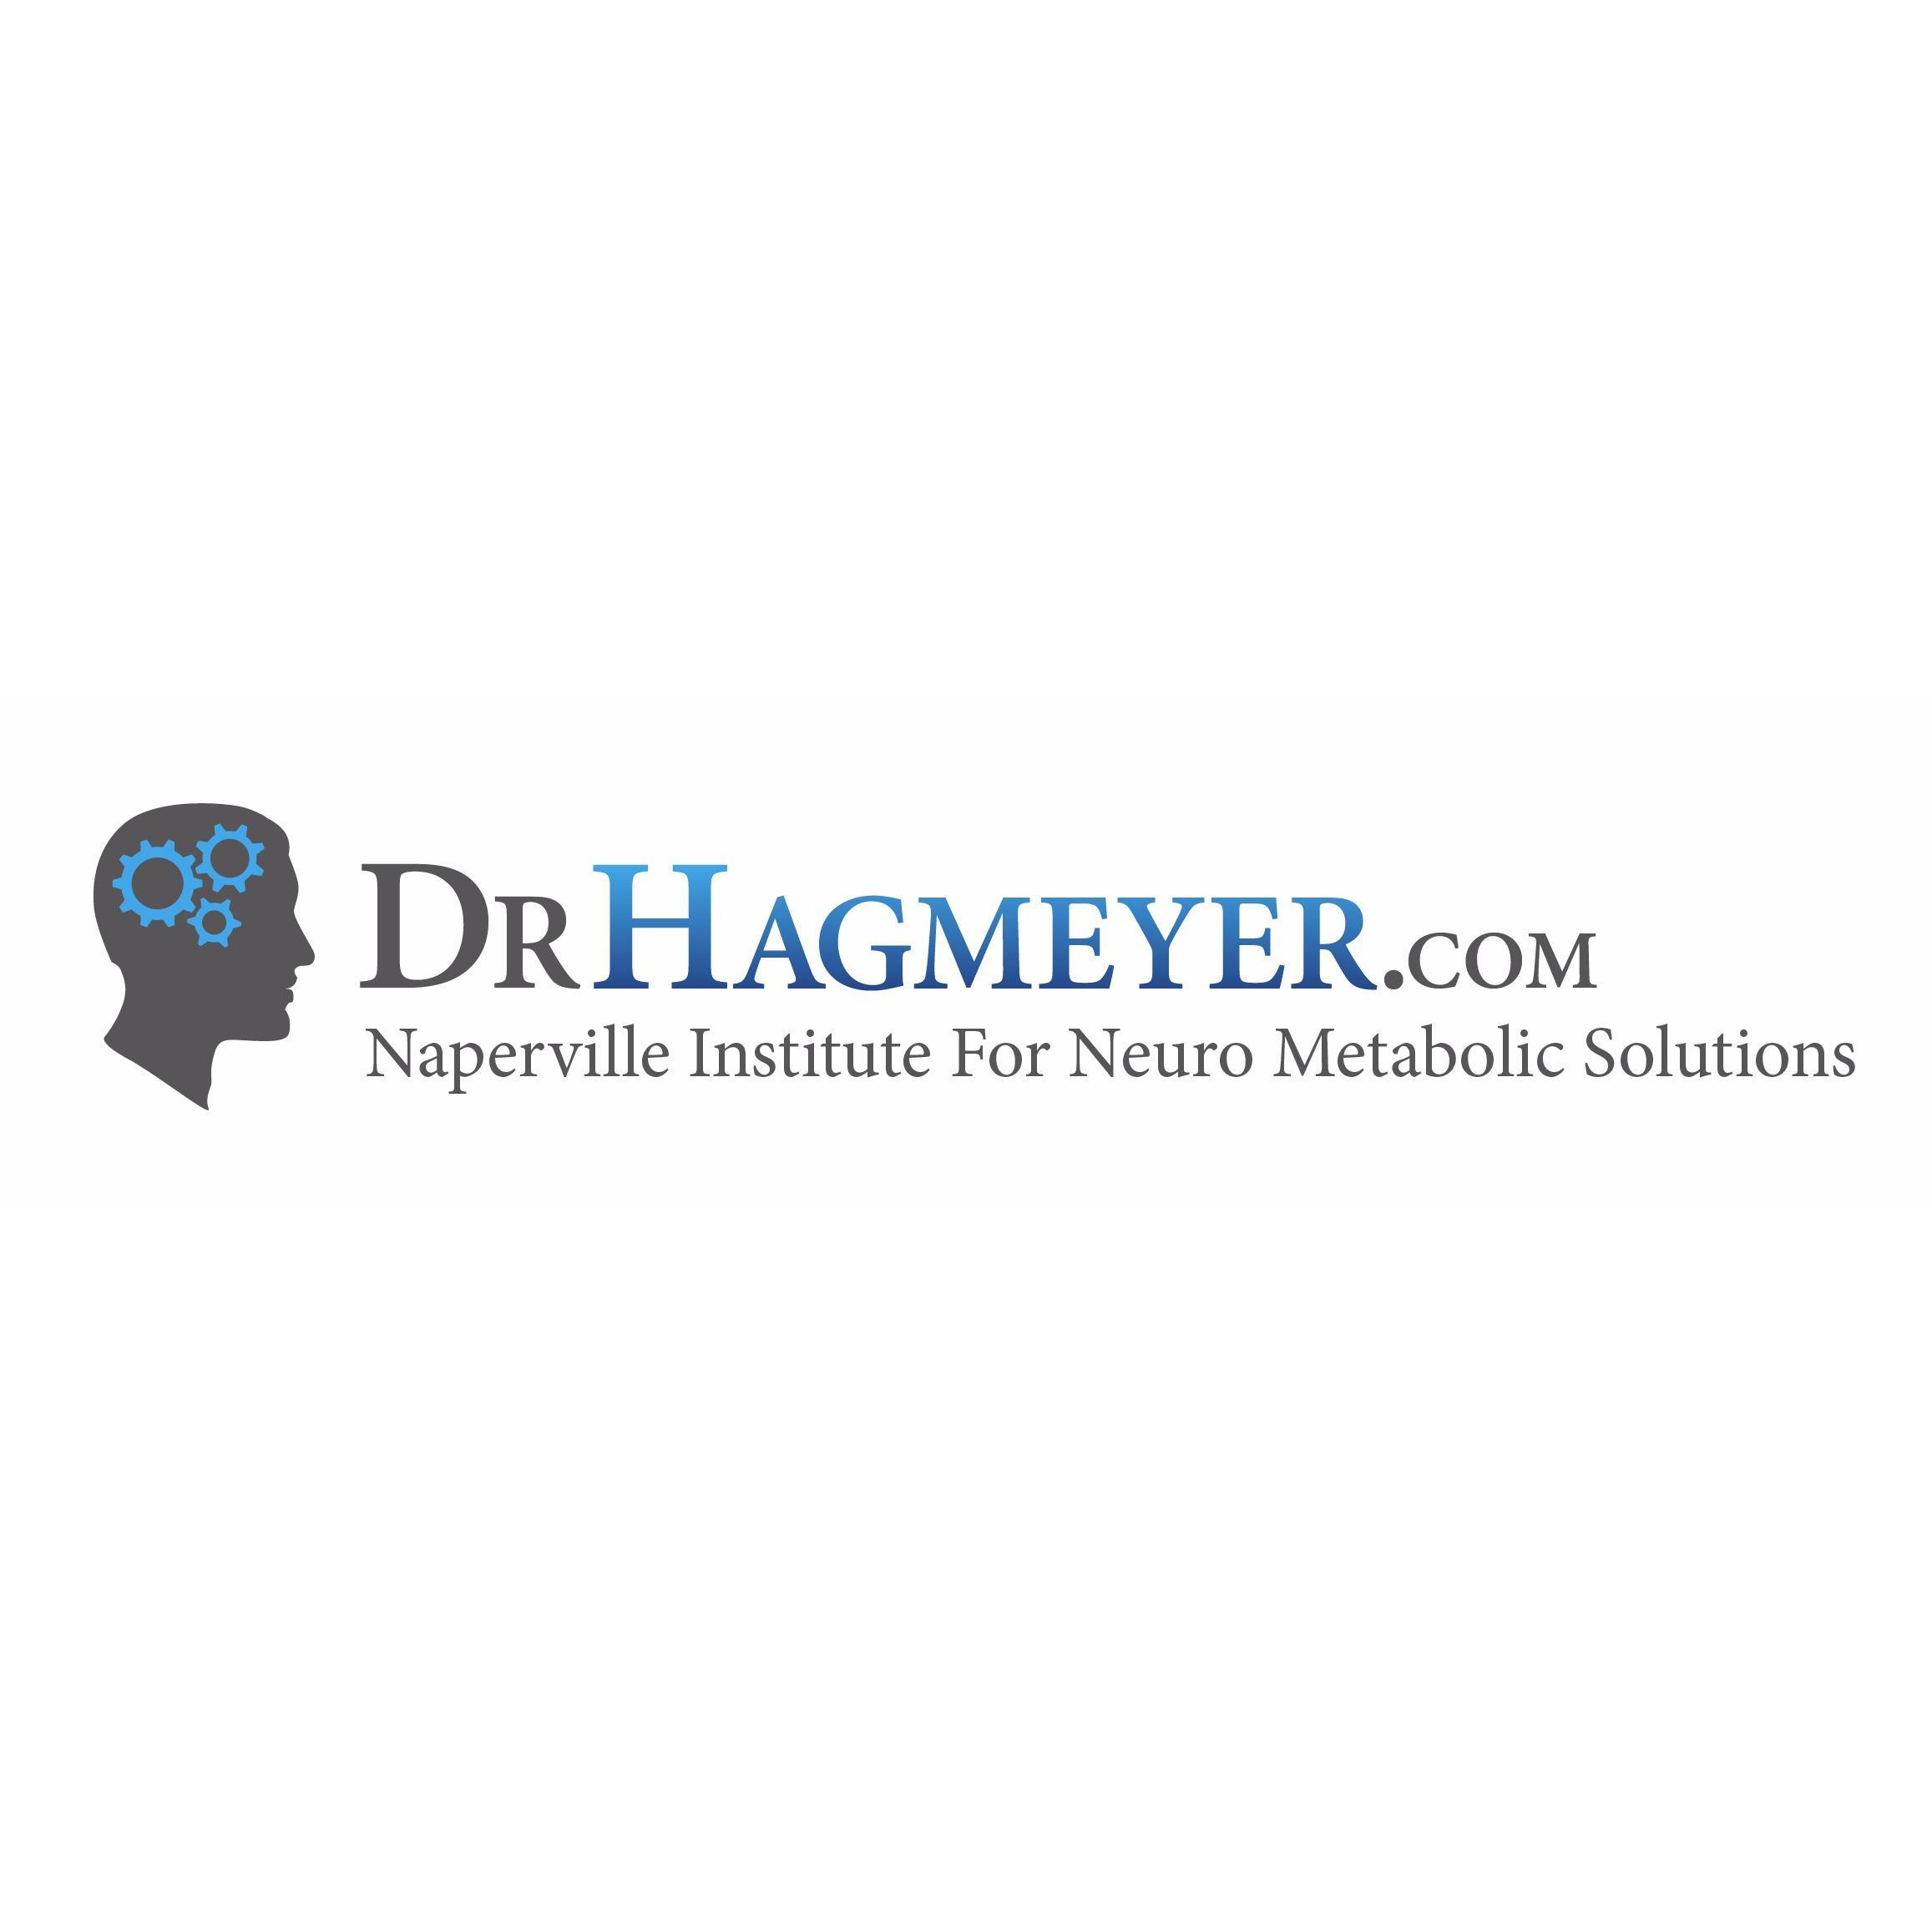 Dr. Hagmeyer: Holistic & Functional Medicine for Chronic Health Problems